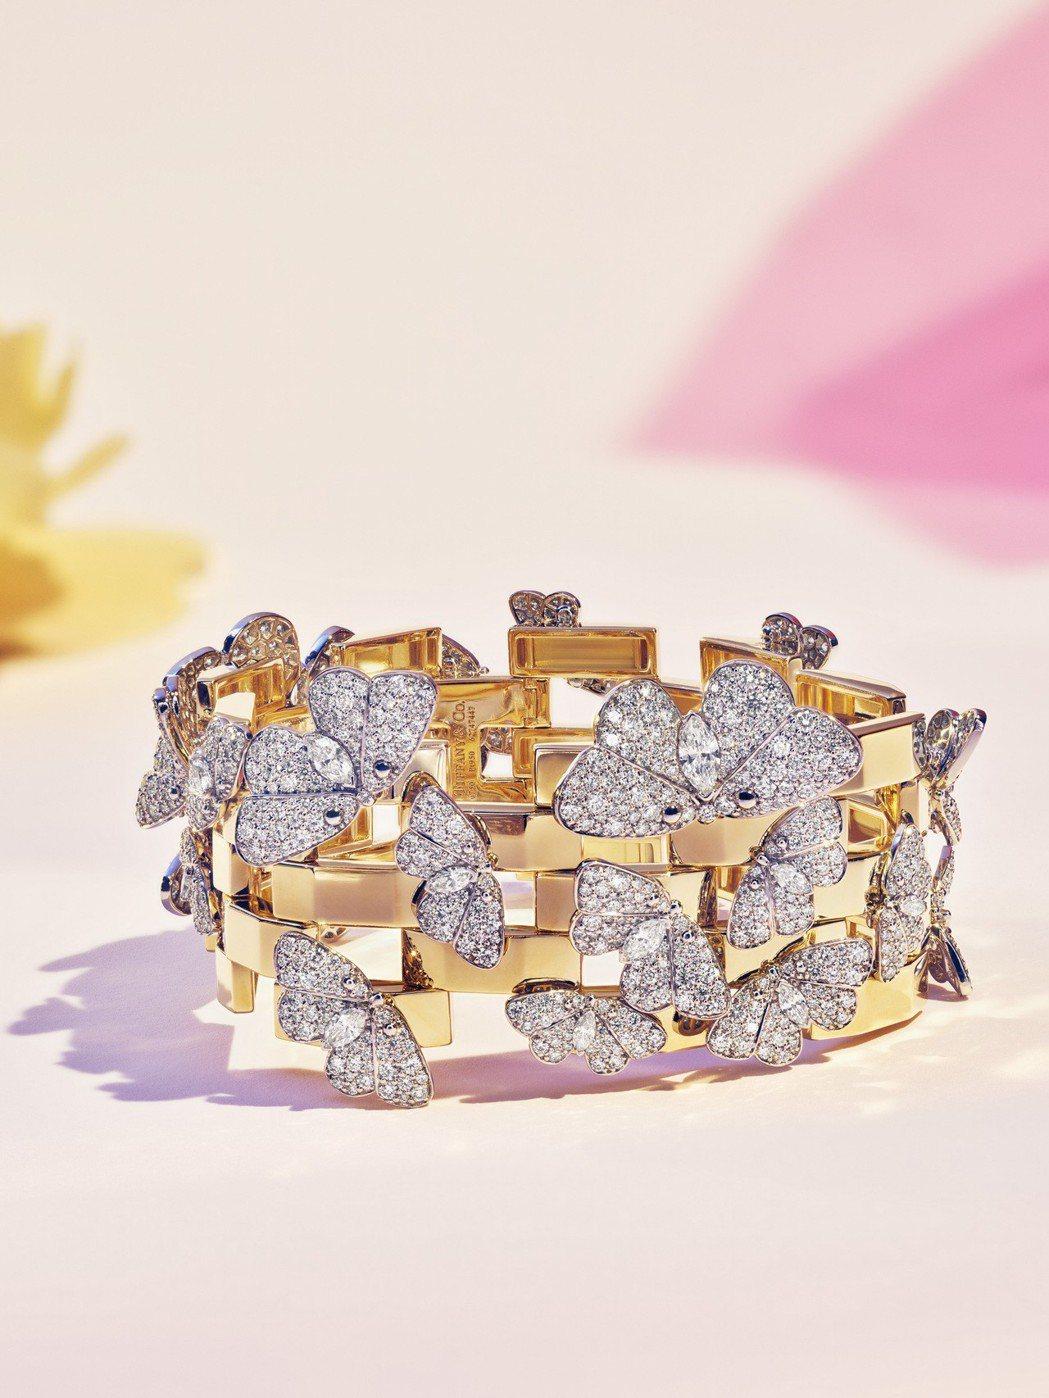 Tiffany 2018 Blue Book系列夏季主題,鉑金與18K金鑲嵌混合...